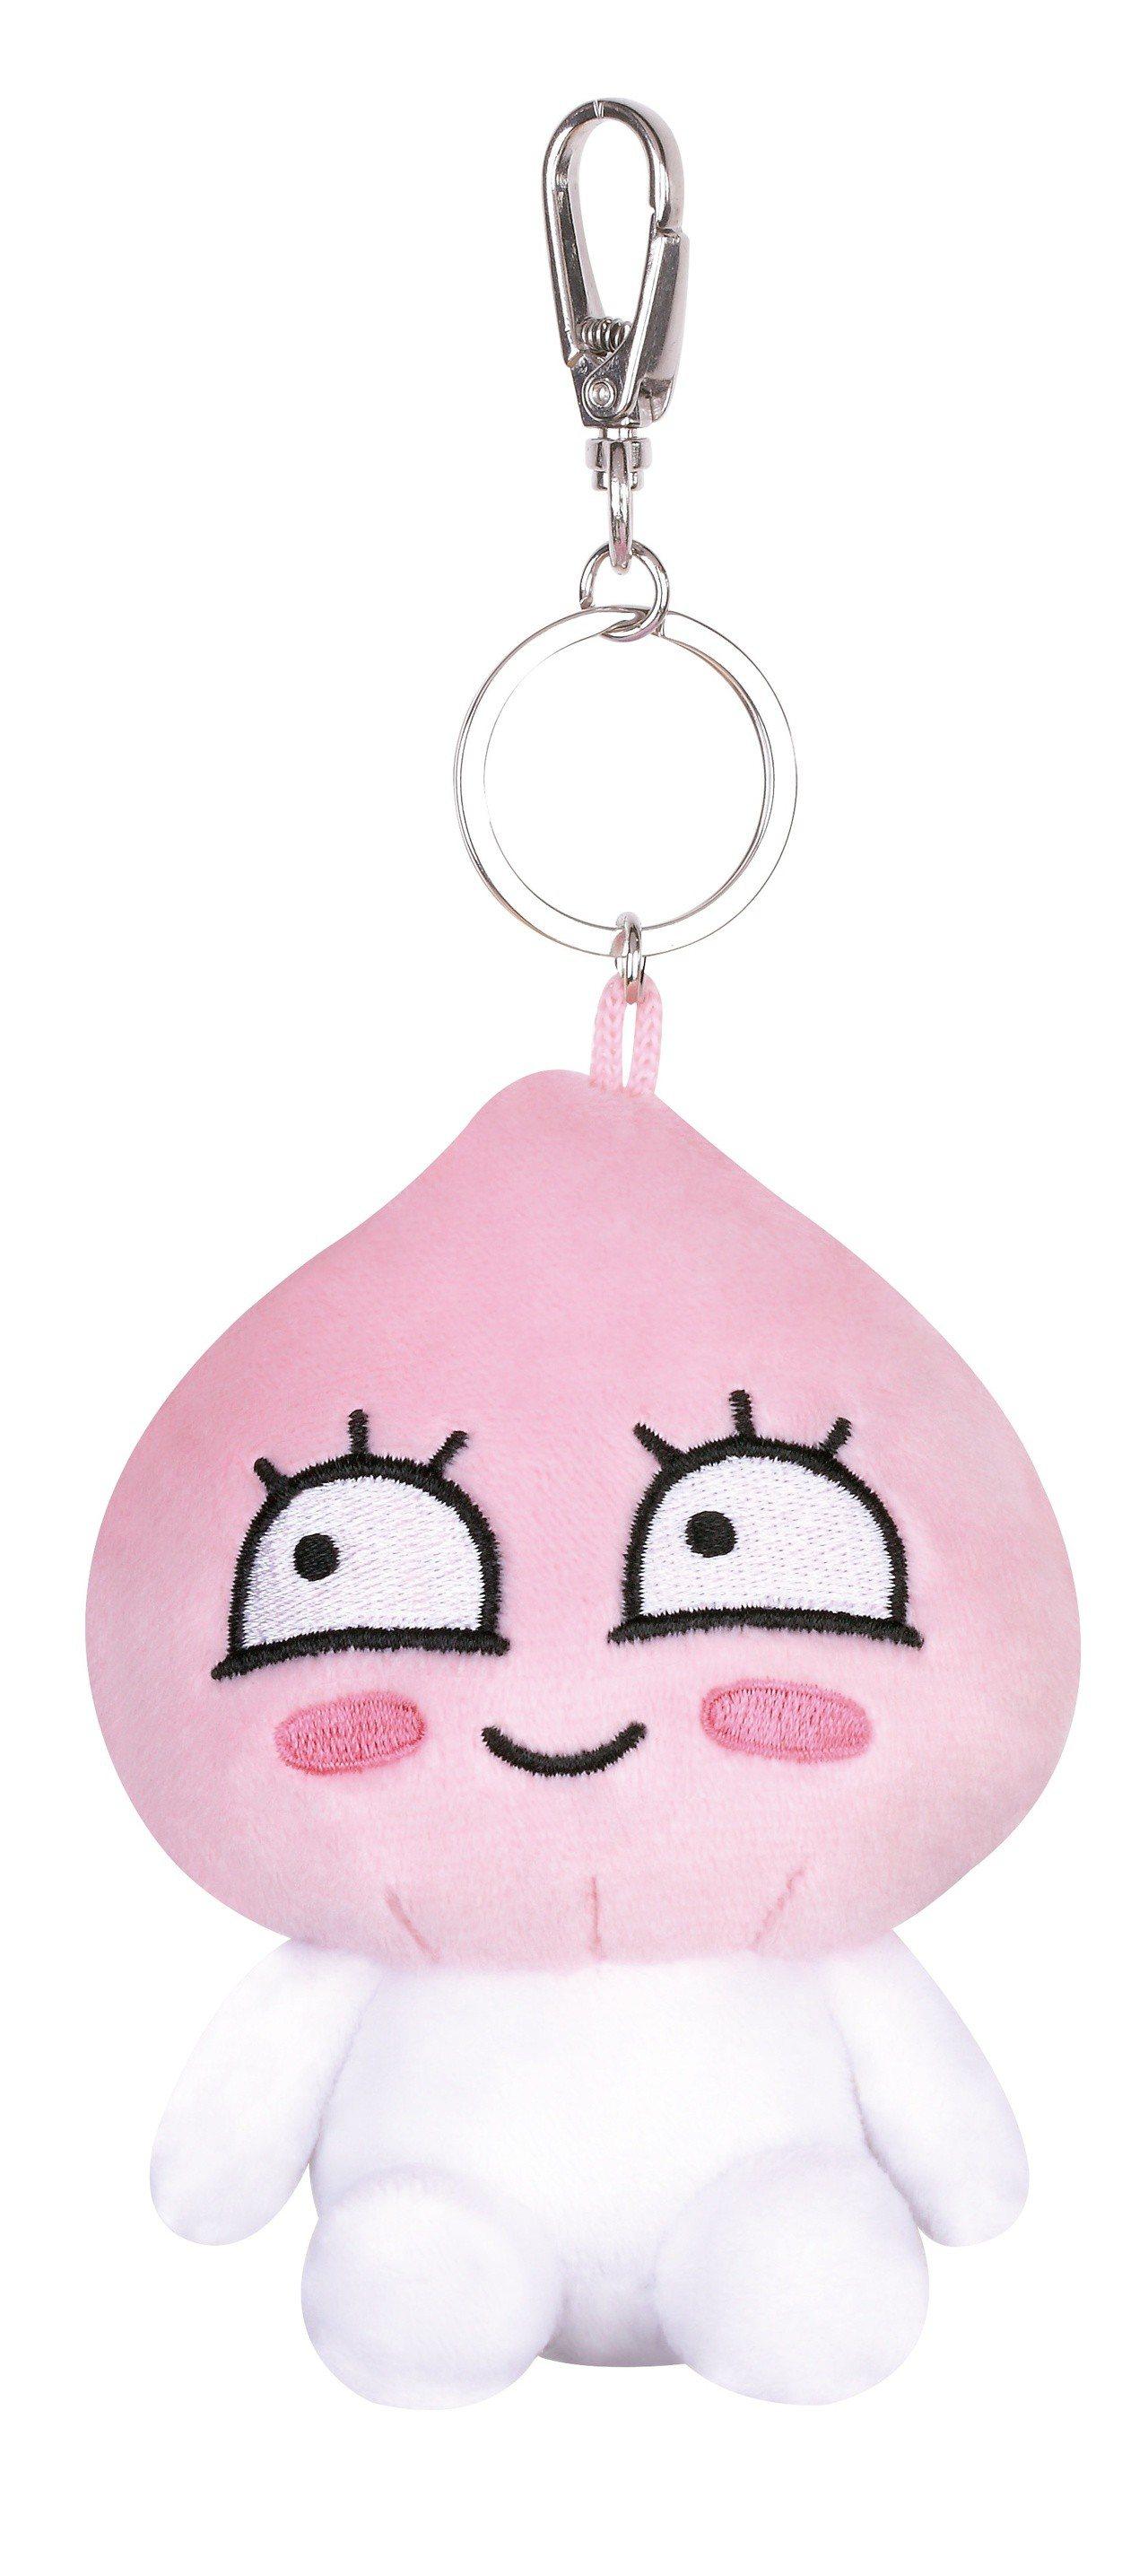 Kakao Friends玩偶吊飾-Apeach,800點+149元可換購一款(...